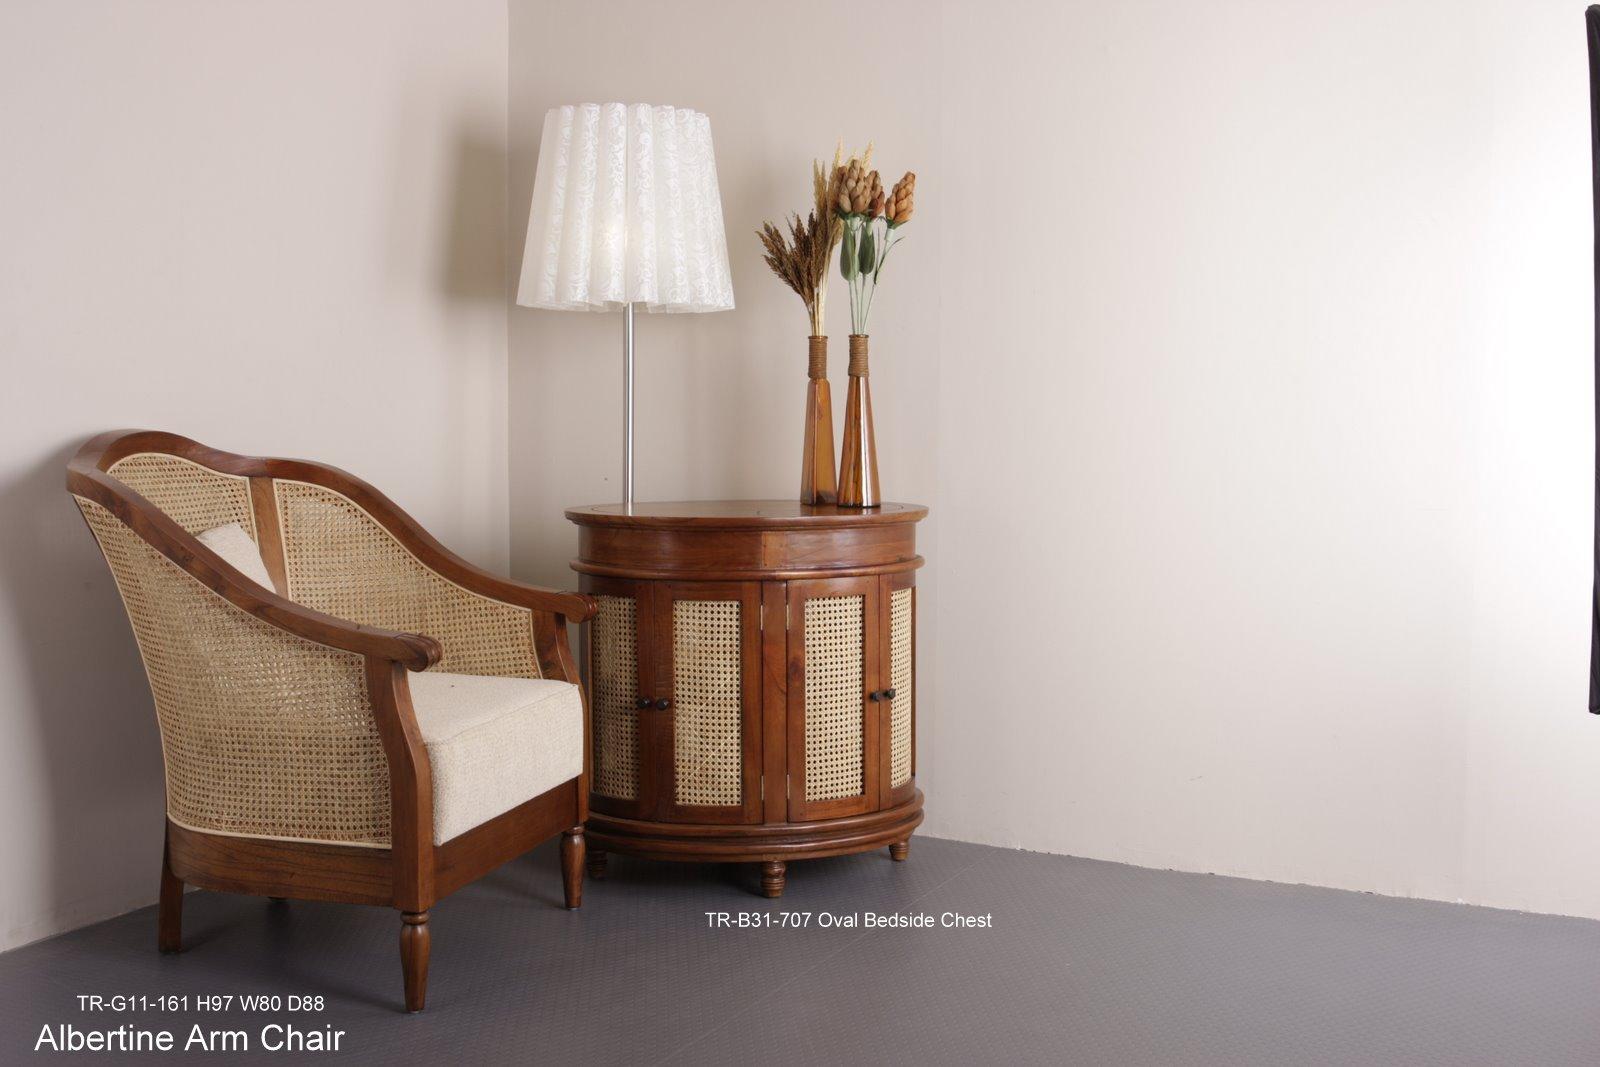 Albertine Arm Chair--.jpg